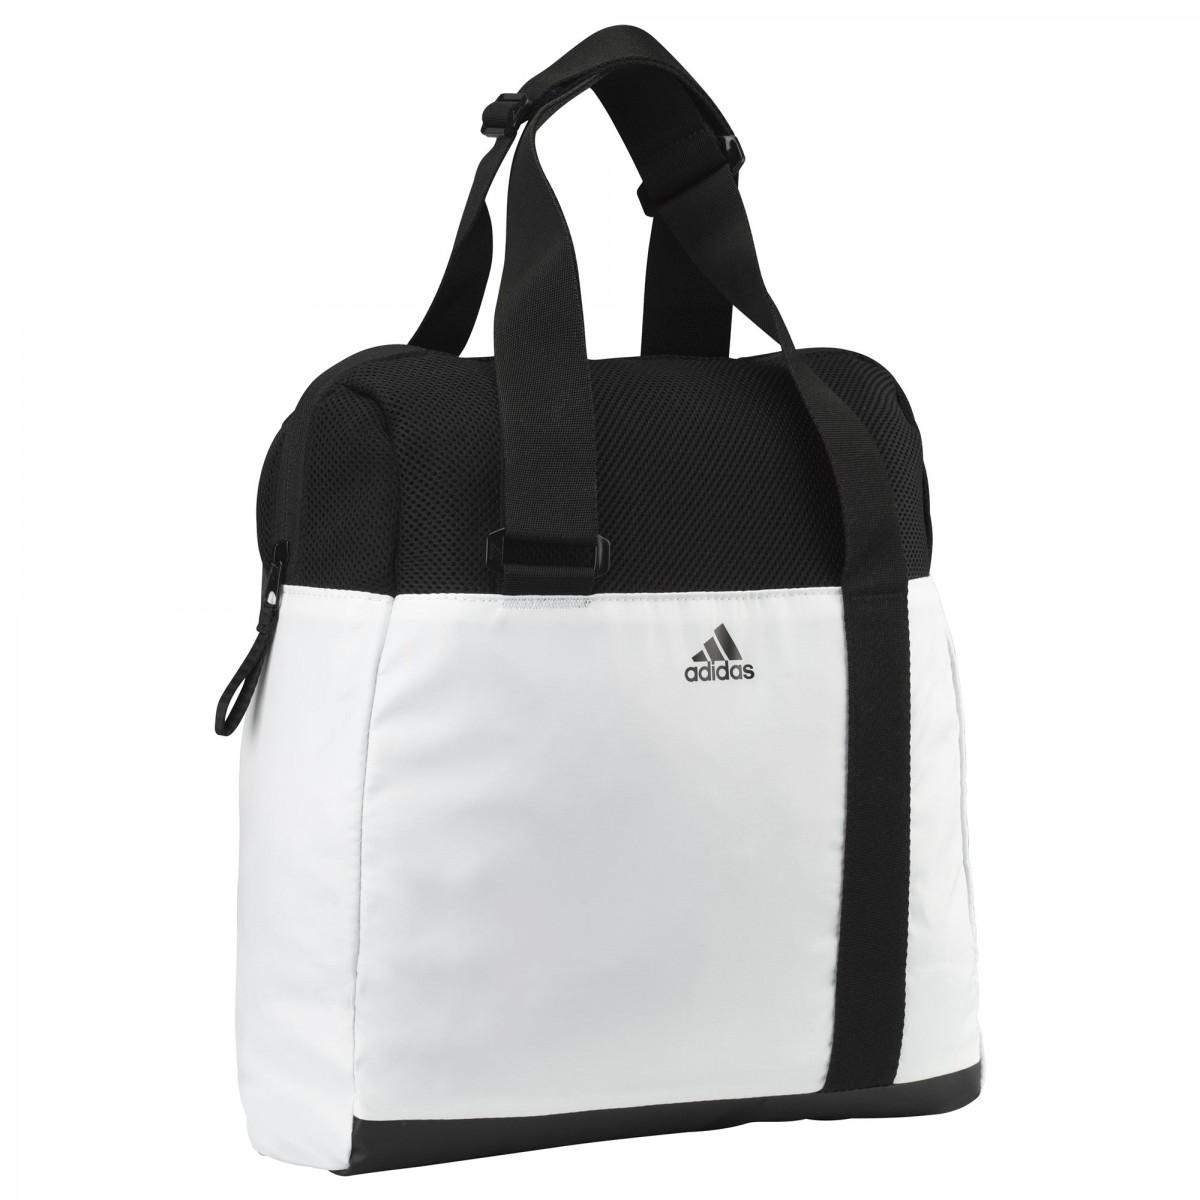 25f05b8e5 Bolsa Adidas Shoulder Cool Training W | Treino e Corrida